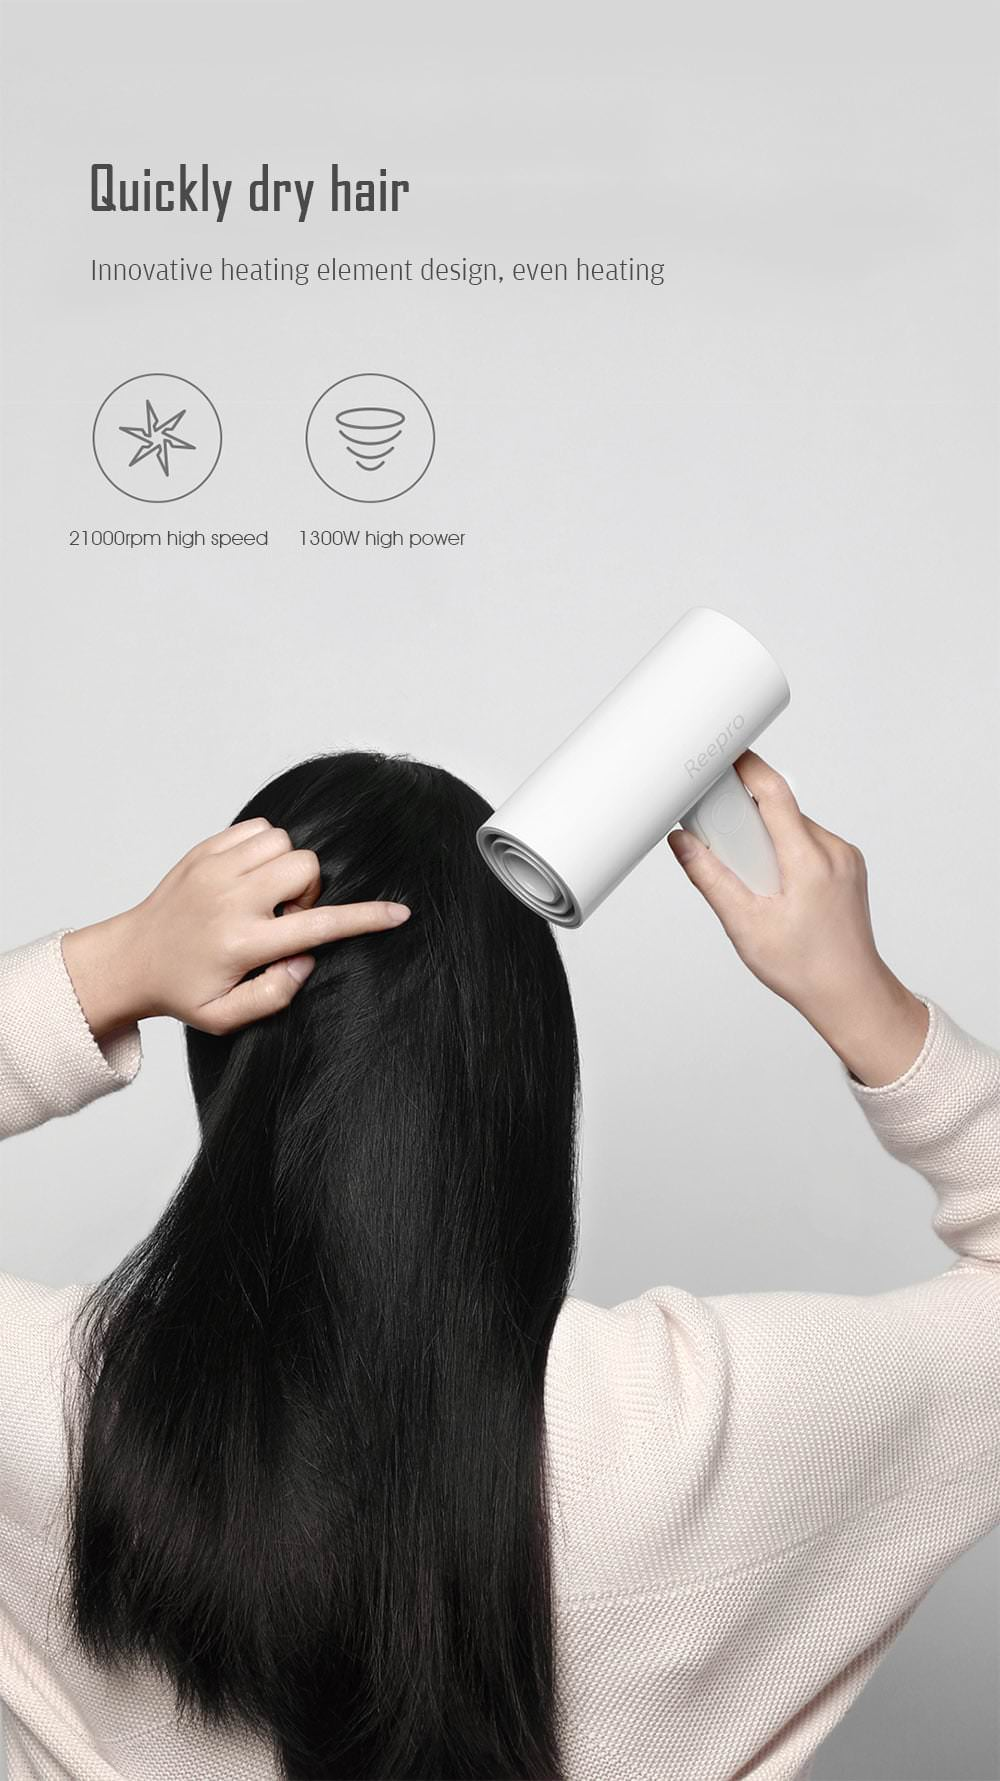 reepro rp-hc04 mini hair dryer